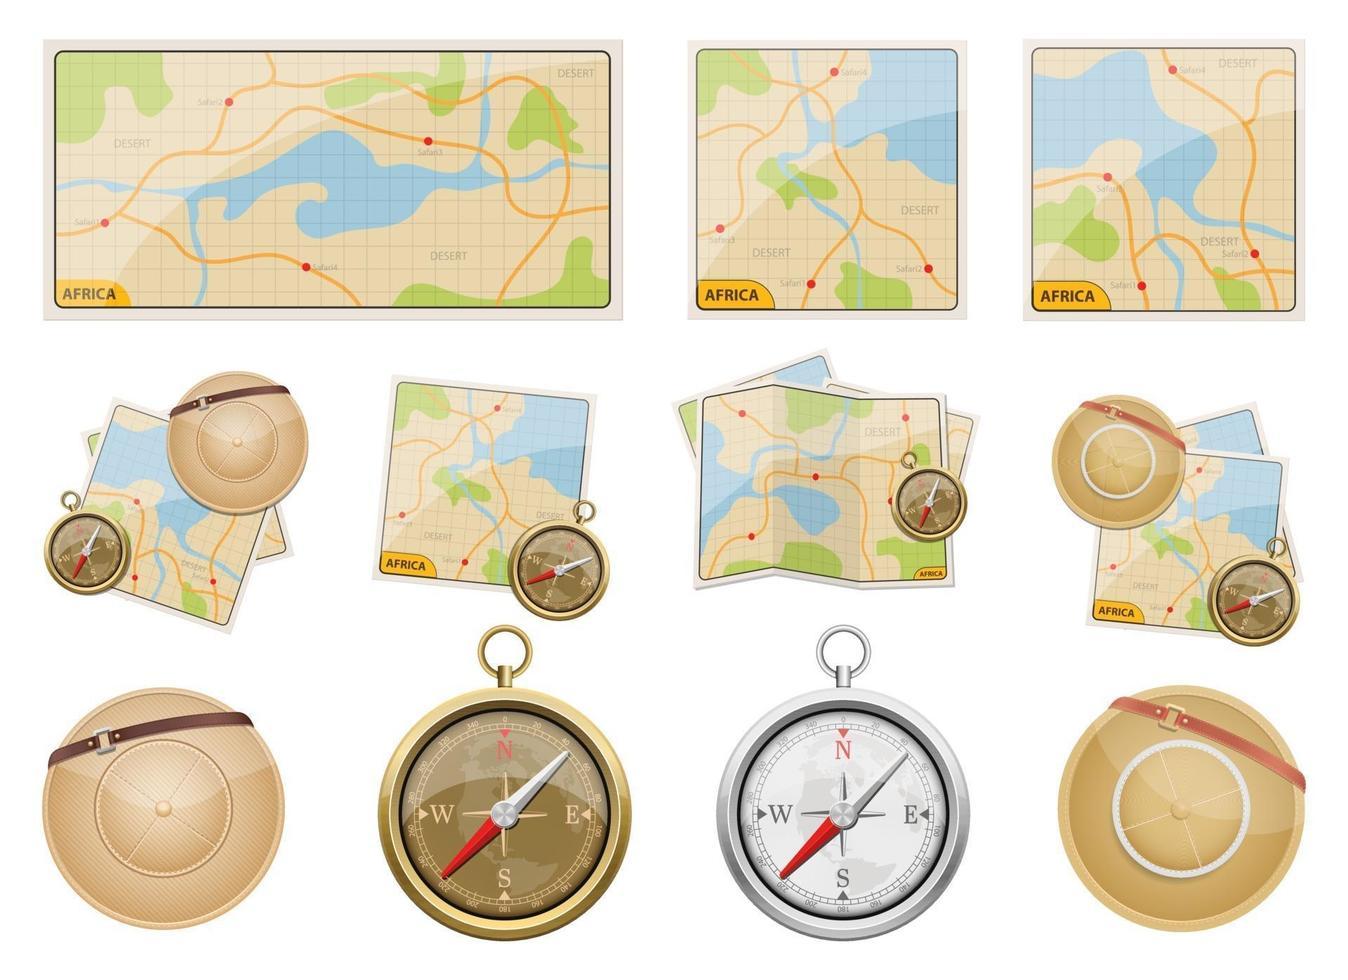 Africa safari map vector design illustration set isolated on white background